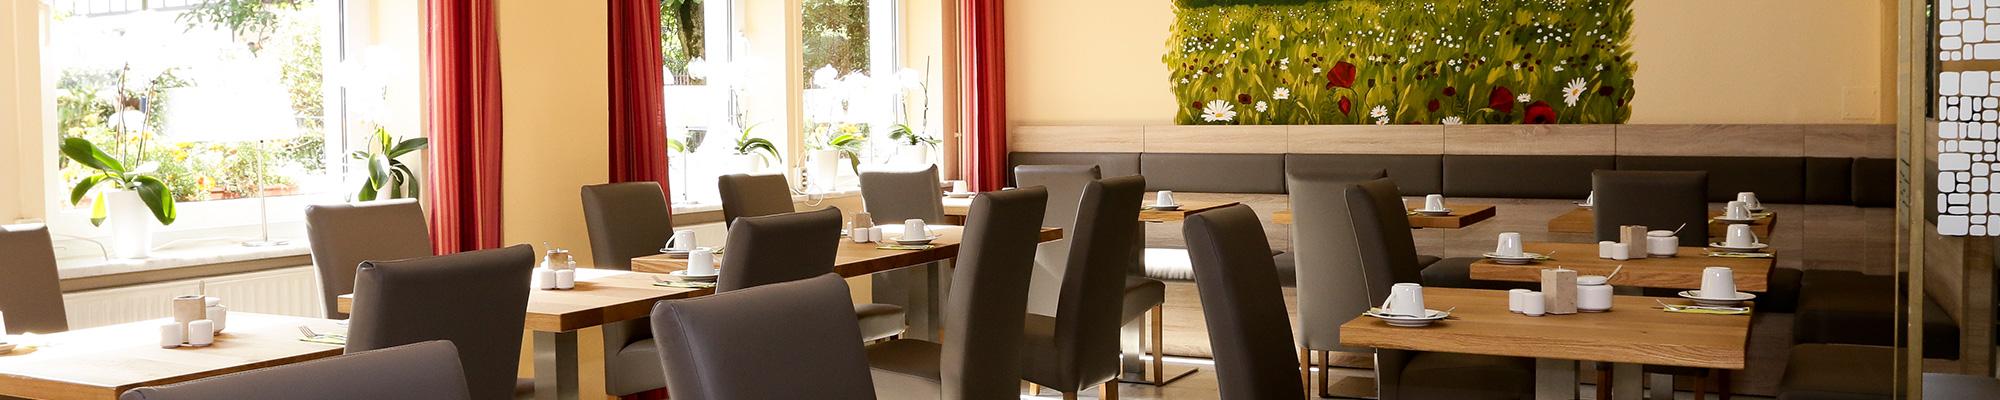 Hotel garni Grundmühle Frühstück